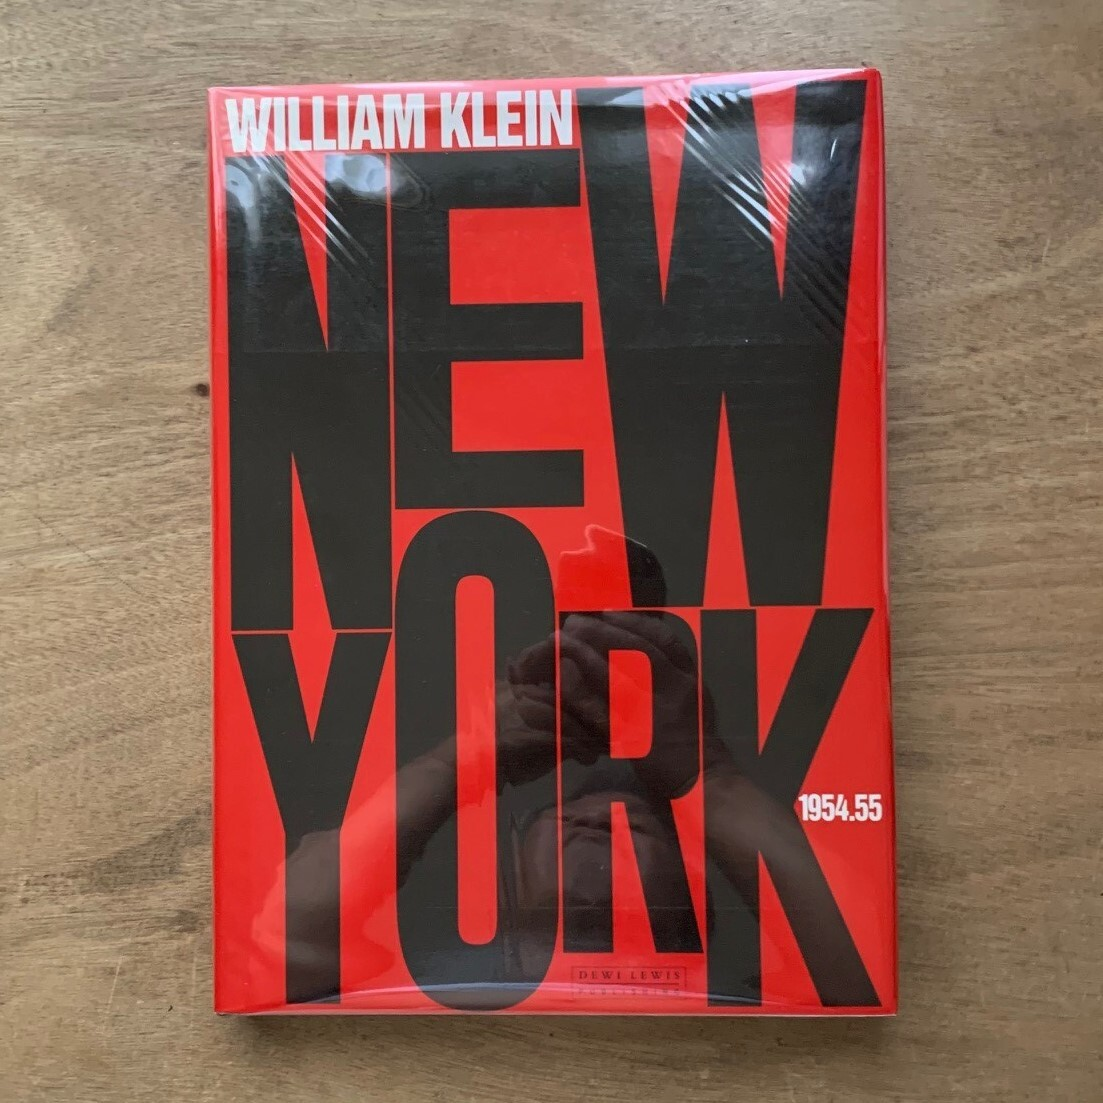 NEW YORK 1954.55 WILLIAM KLEIN / ウィリアム・クライン 写真集